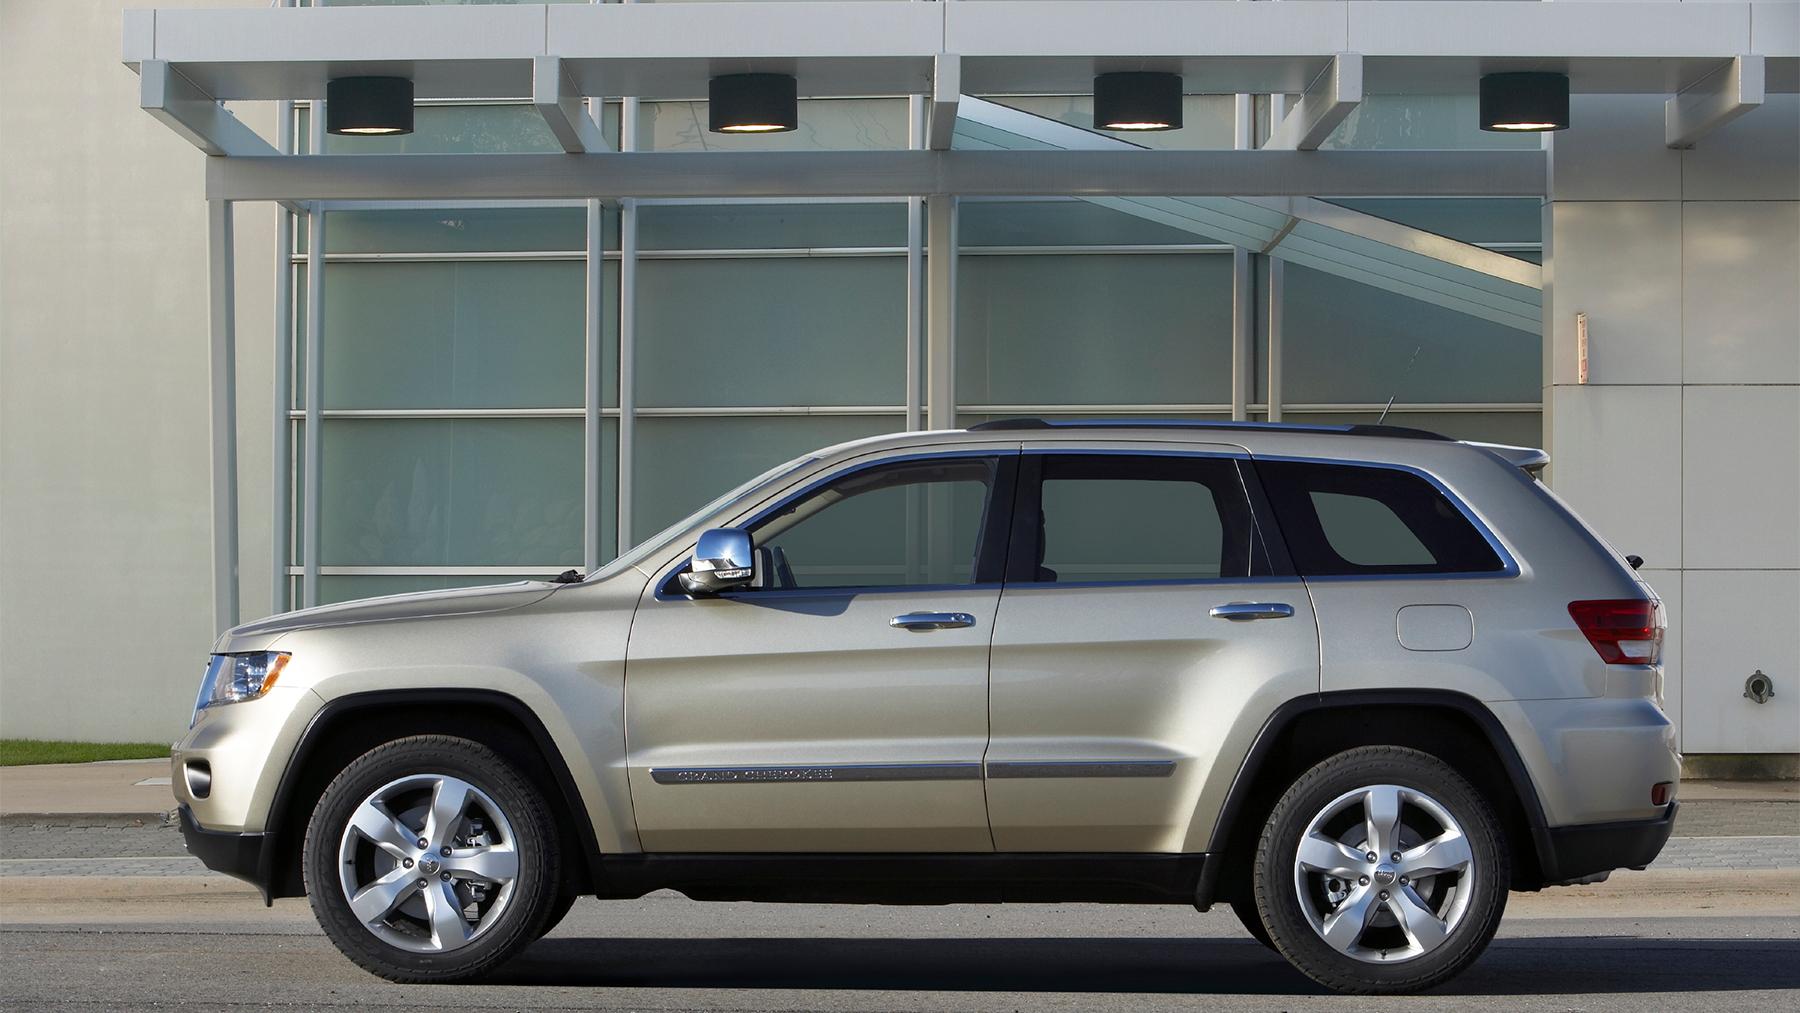 2011 jeep grand cherokee 009